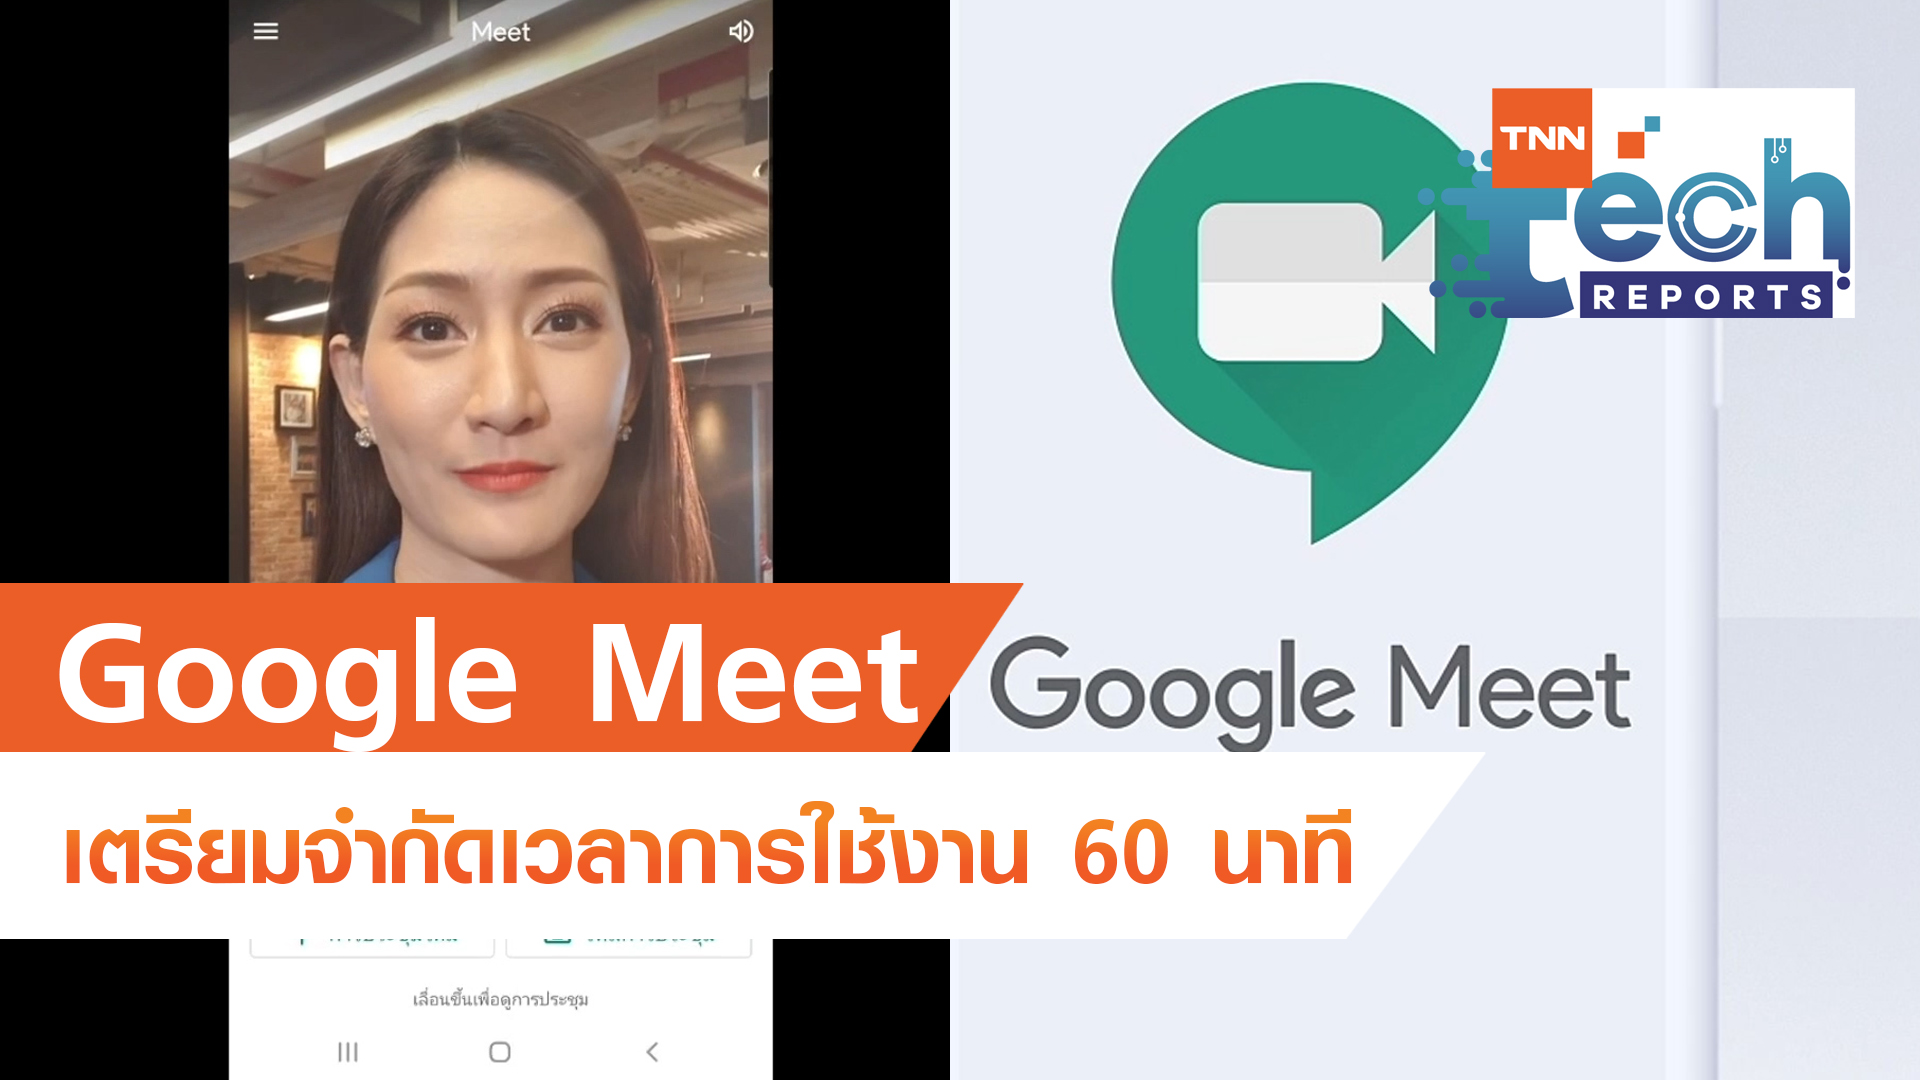 Google Meet เตรียมจำกัดเวลาการใช้งาน | TNN Tech Reports | 07 ต.ค. 63